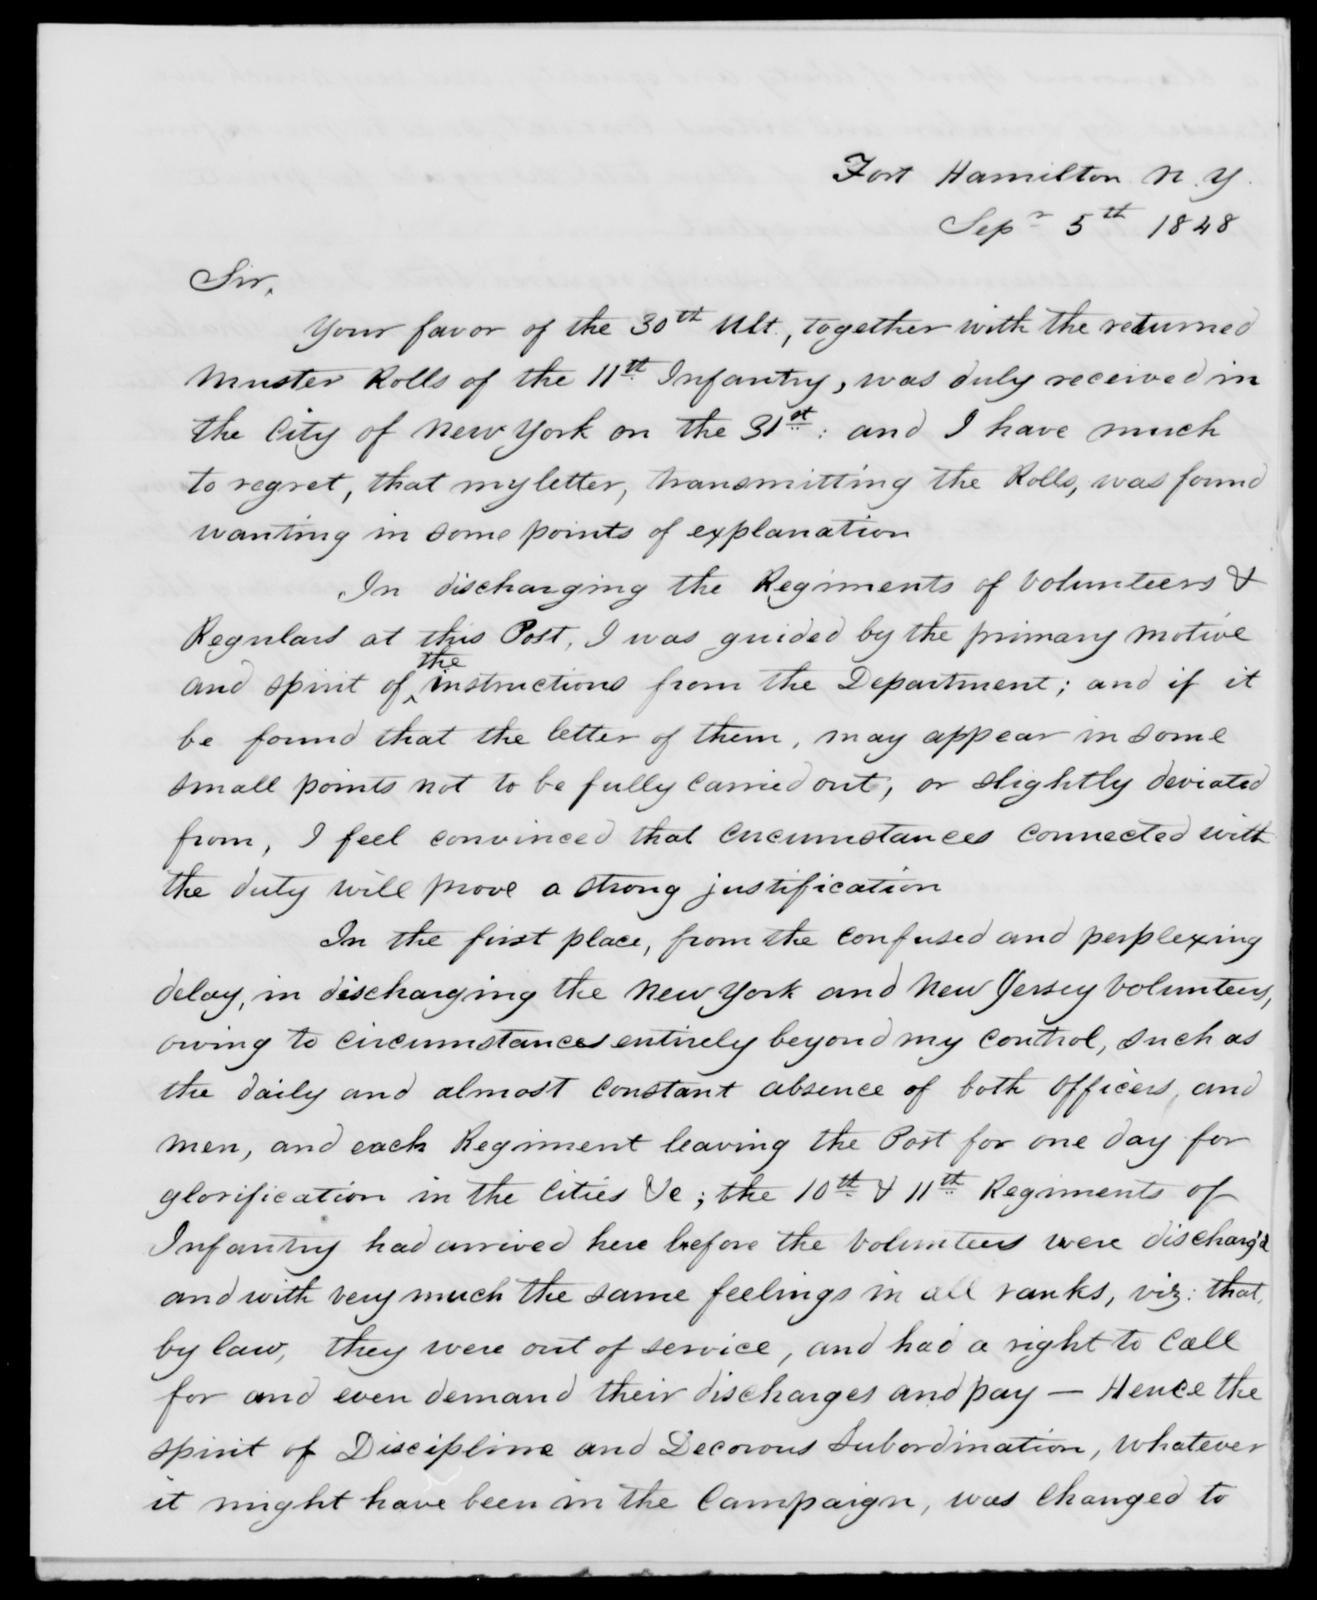 Plympton, J - State: New York - Year: 1848 - File Number: P383